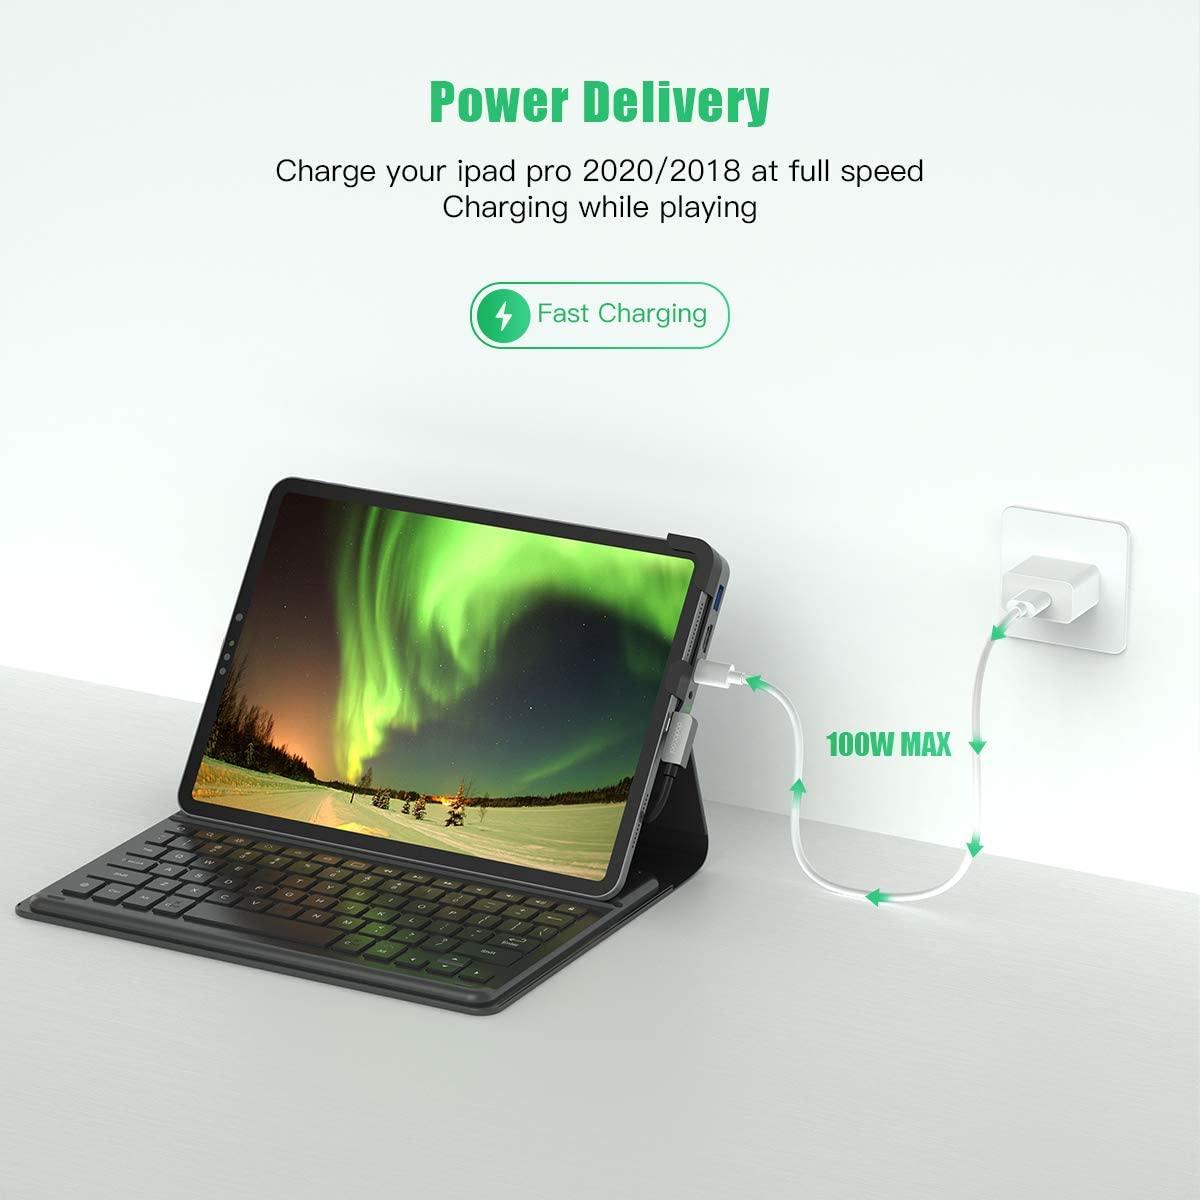 USB C Hub for iPad Pro 2020/2018, 6in1 USB Tpye C to 4K ...